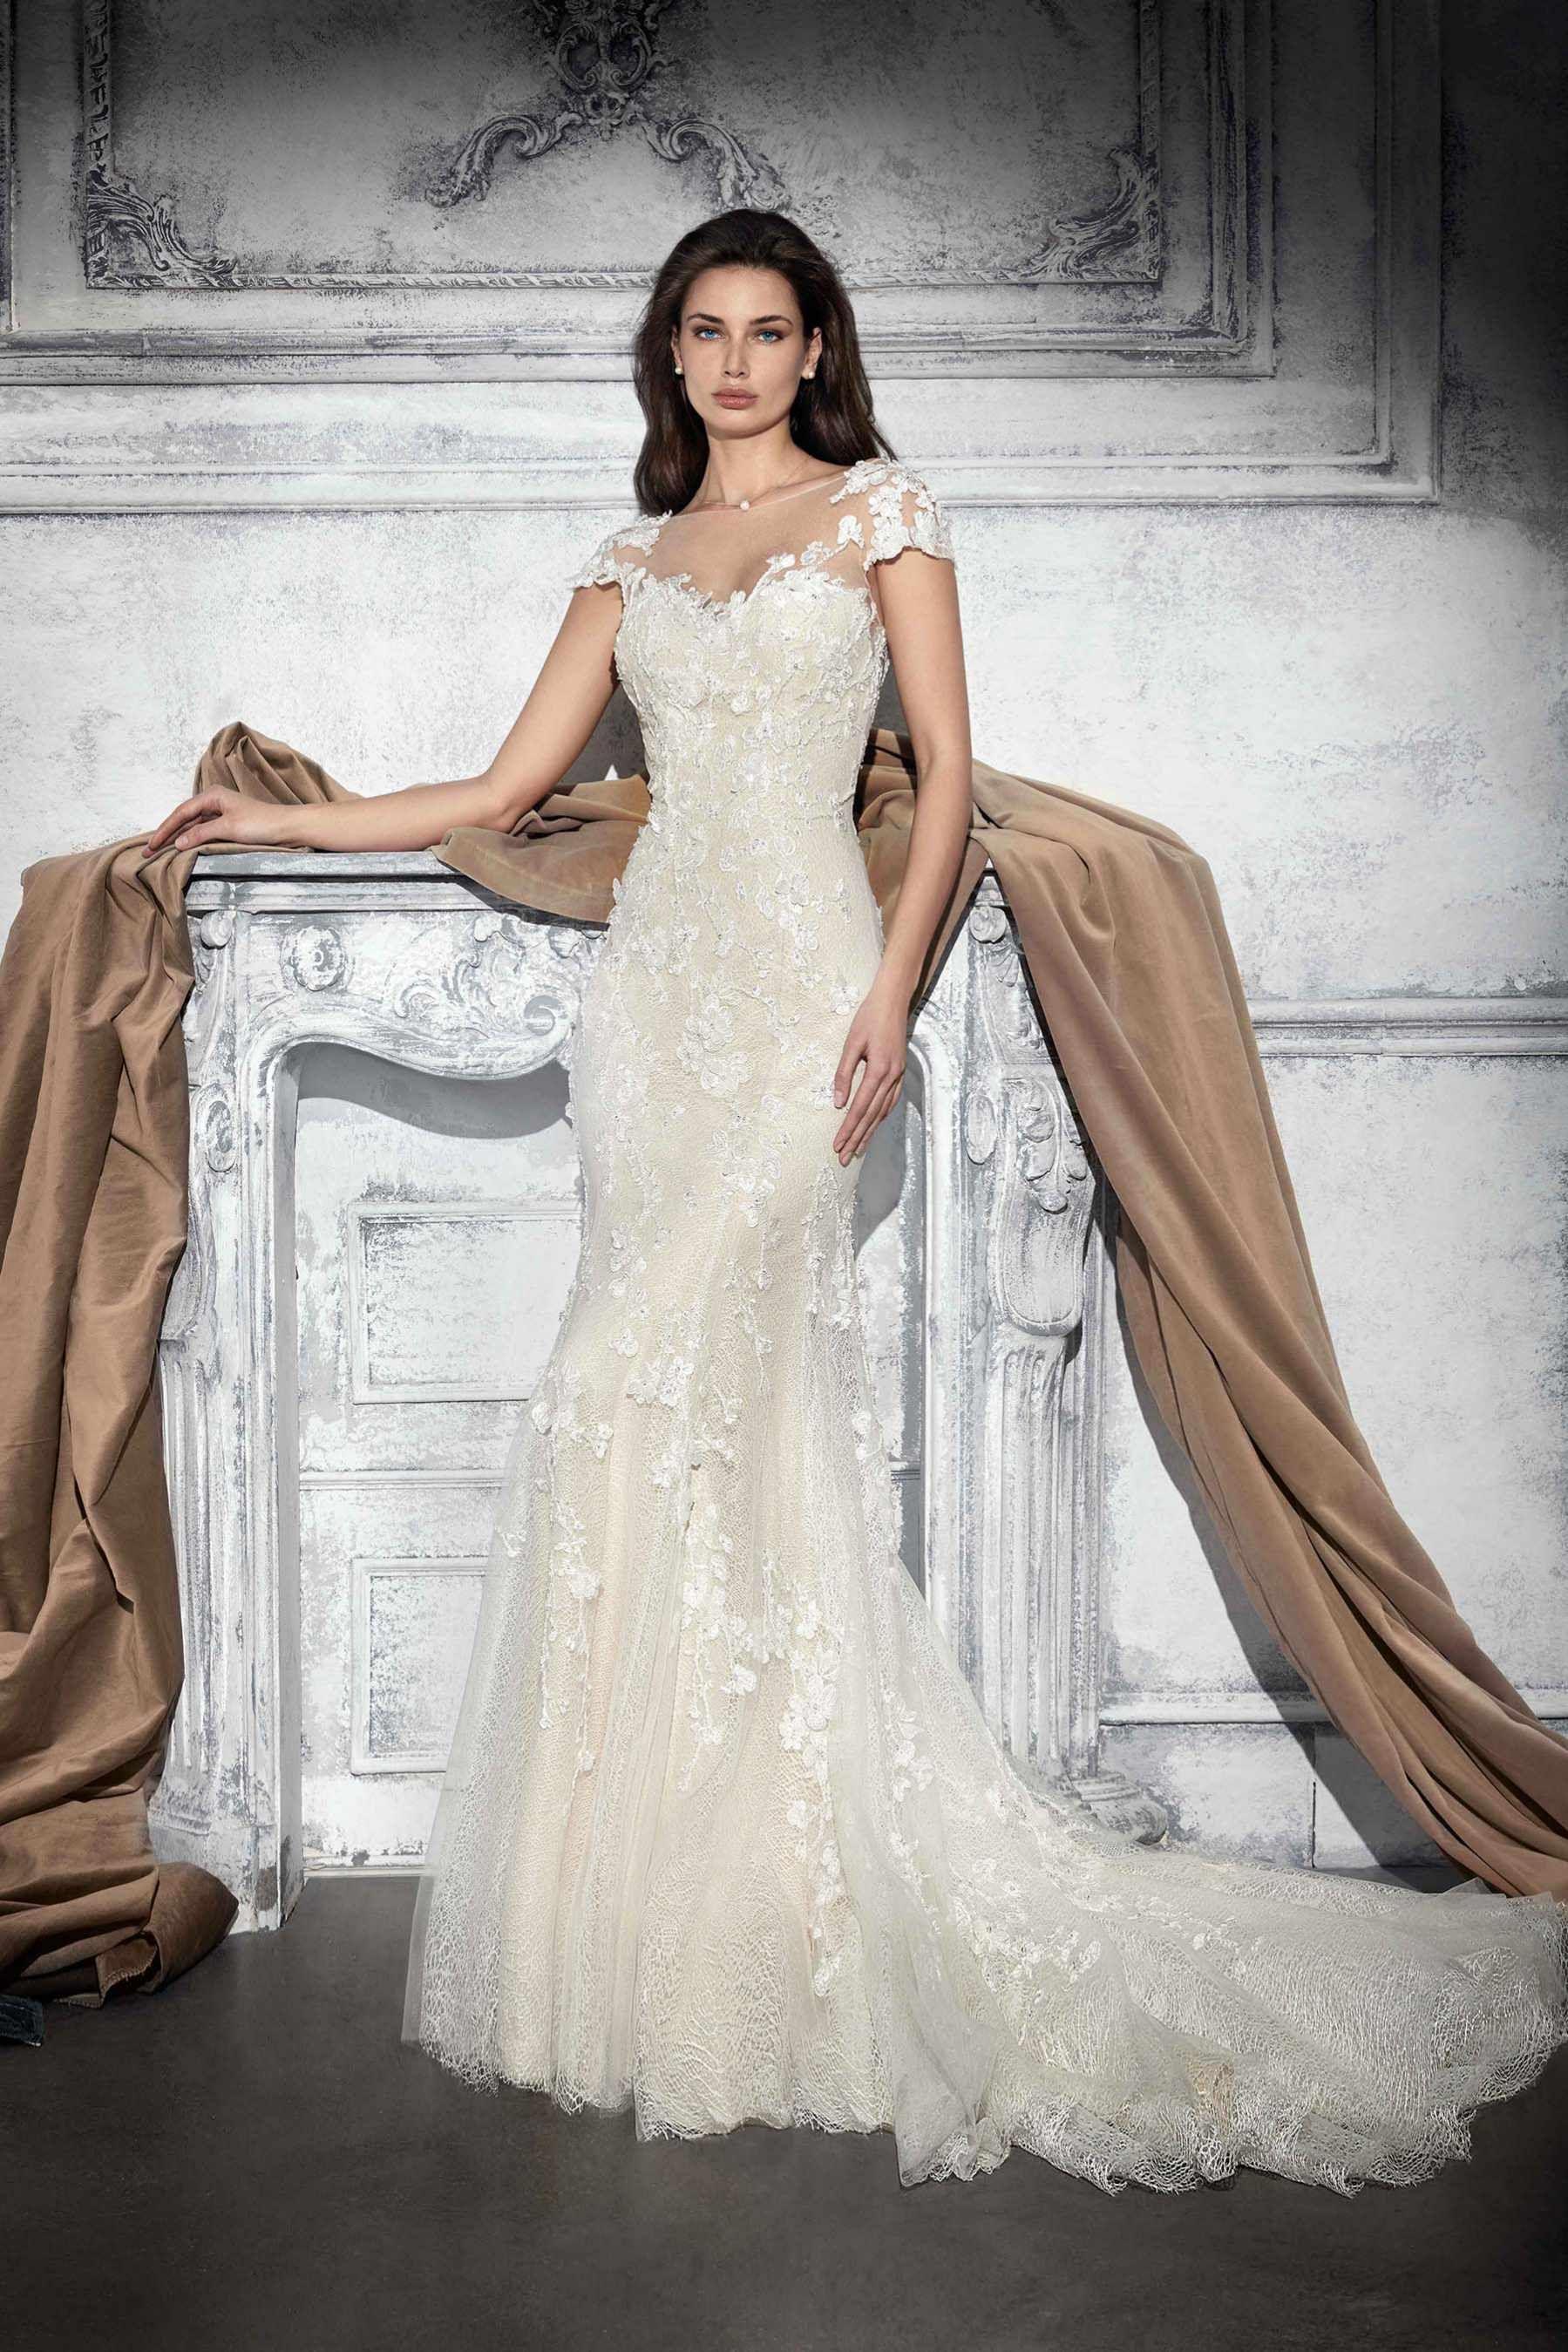 Wedding Dress Style 779 Demetrios wedding dress, Wedding